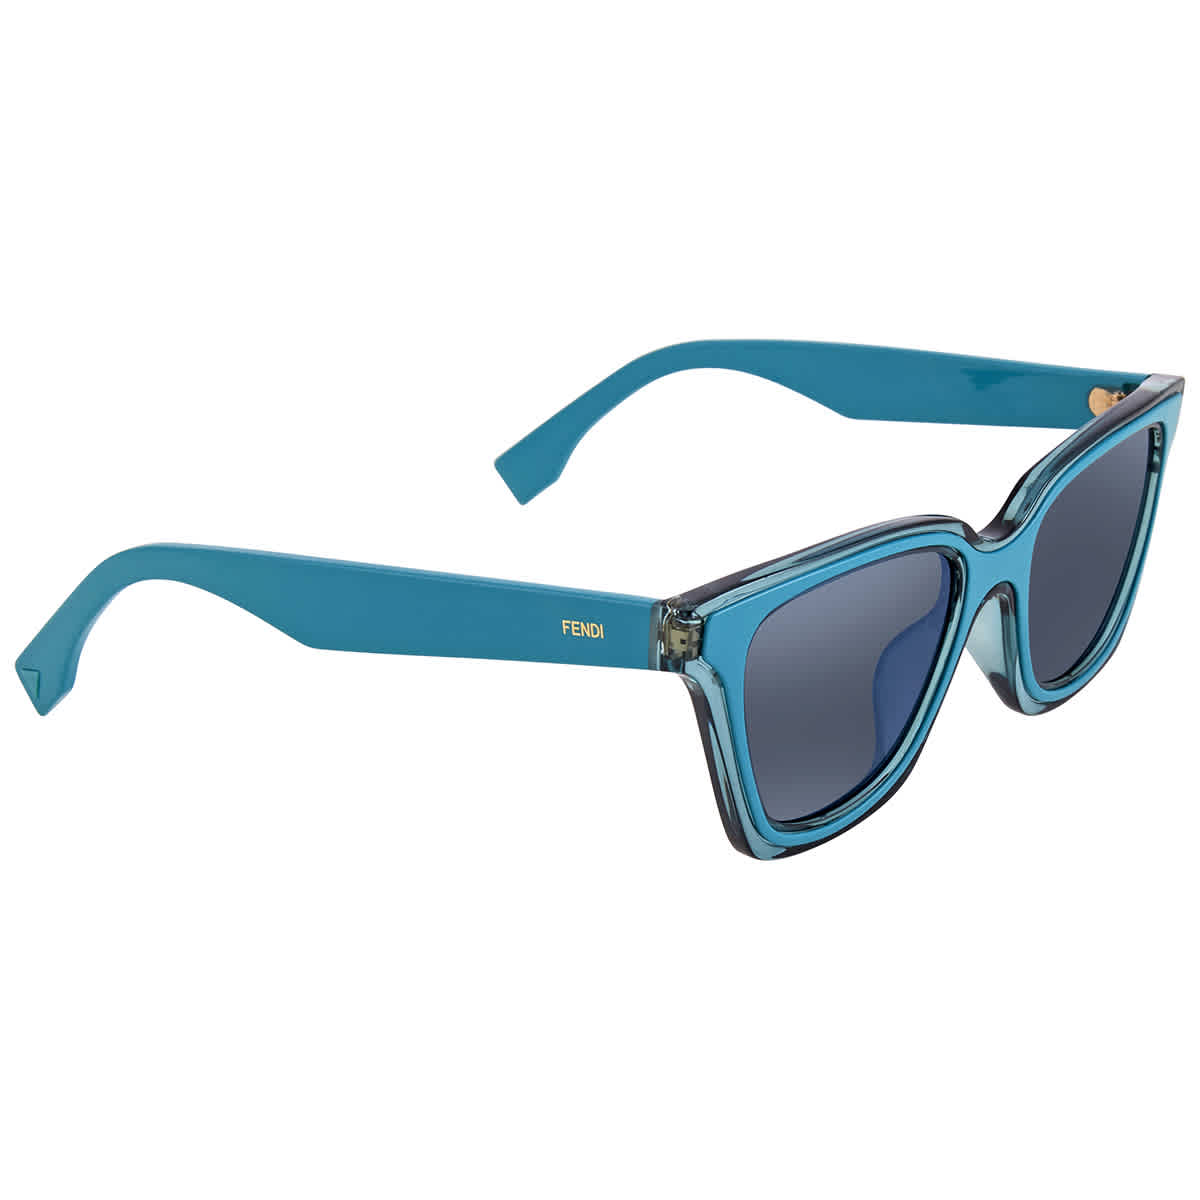 Fendi Turquoise Sunglasses Ff 0195/s Klb -50 In Blue